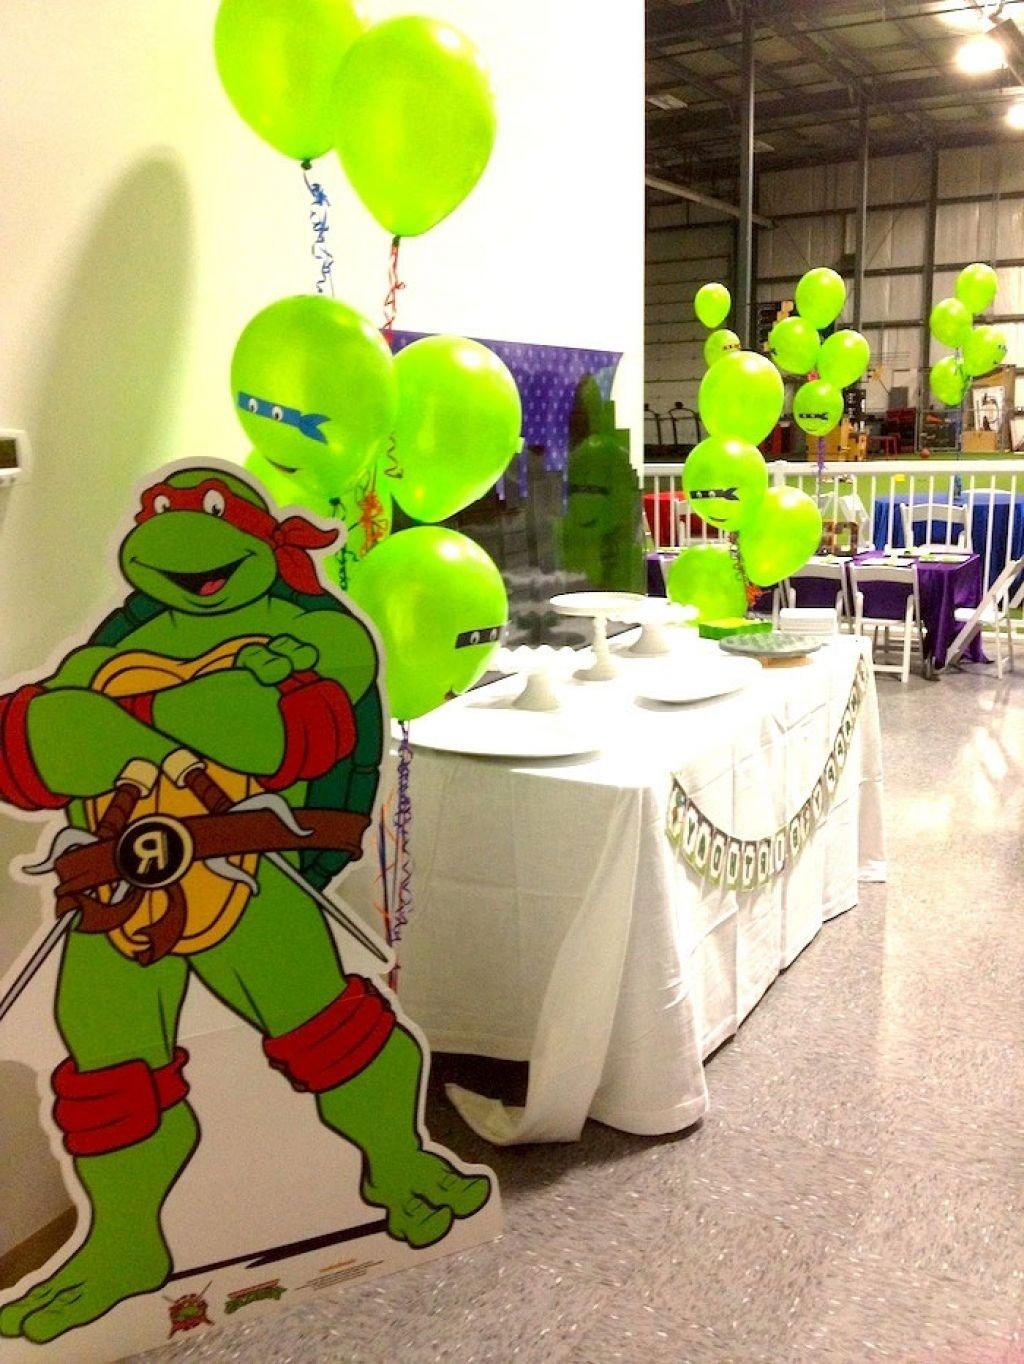 10 Best Ninja Turtle Party Decoration Ideas ninja turtle party decorations unique ninja turtle decorations 2020